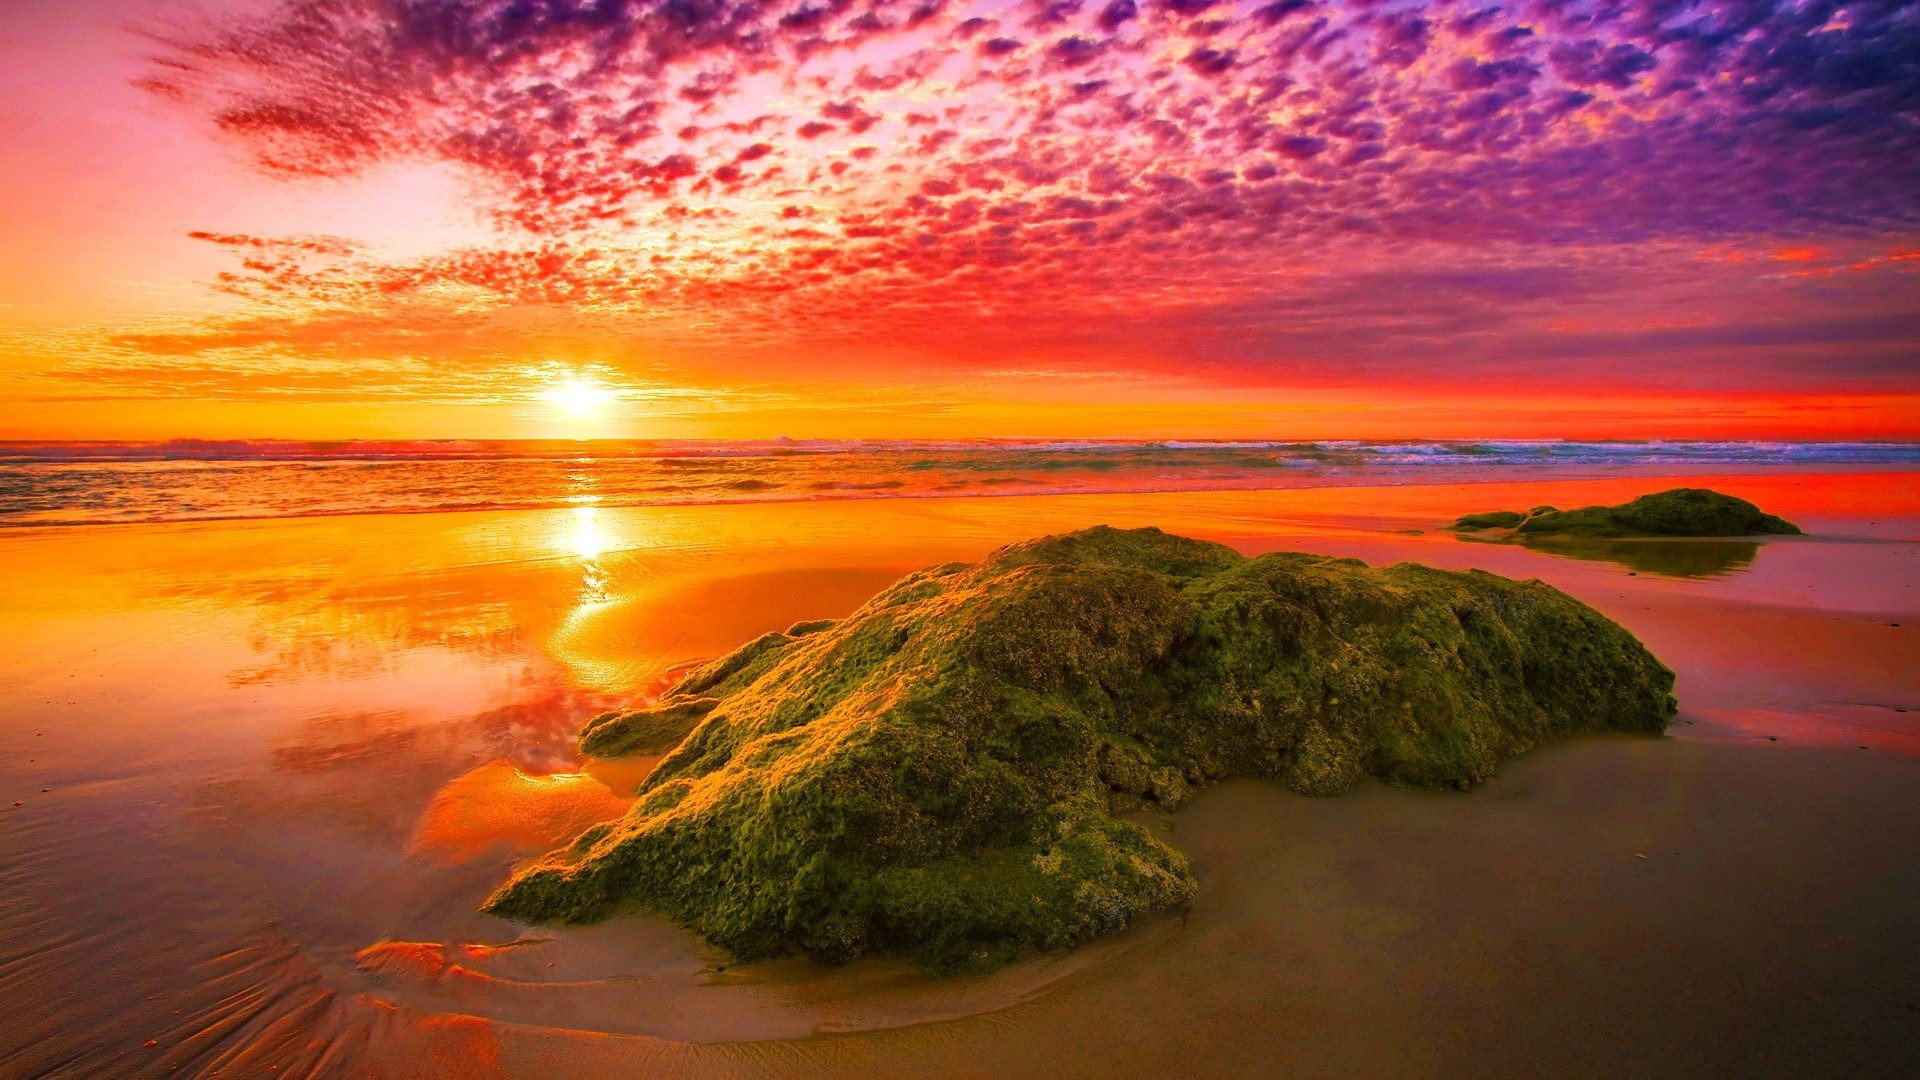 Sunset – Amazing Sunset Light Sunlight Fiery Sea Rocks Sky Nice Sand Nature  Reflection Lovely Beautiful